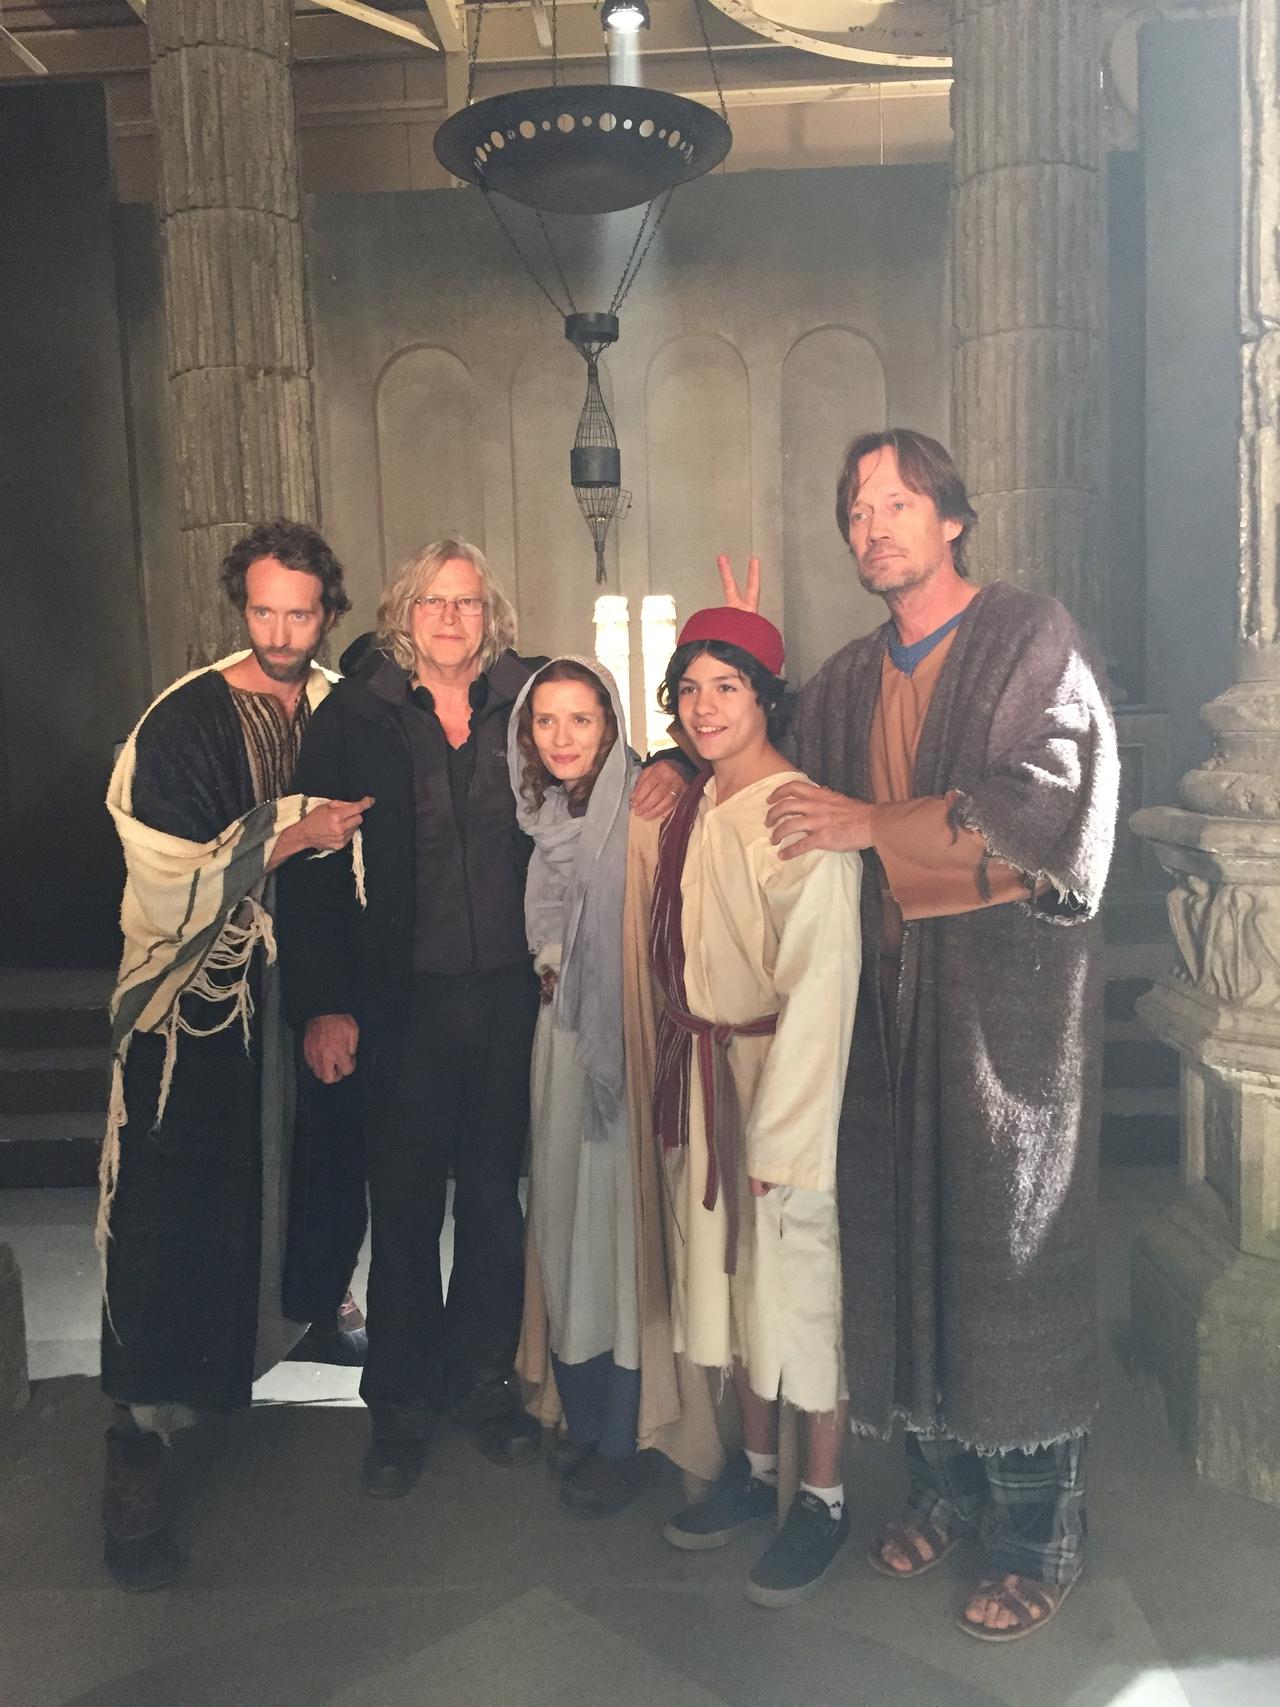 Roger Christian در صحنه فیلم سینمایی Joseph and Mary به همراه Lucius Hoyos